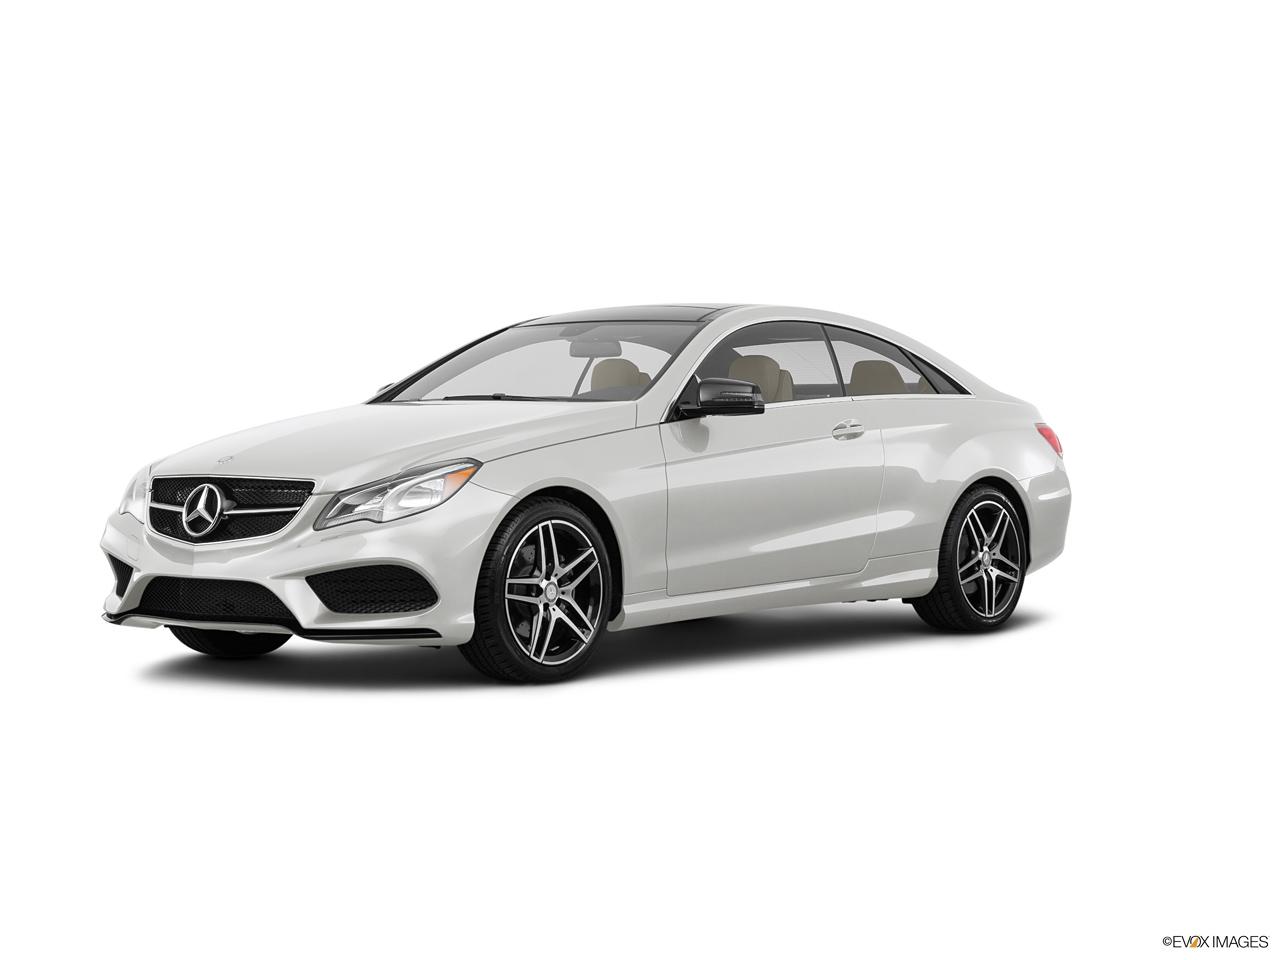 Car pictures list for mercedes benz e class coupe 2017 e for Mercedes benz payment estimator